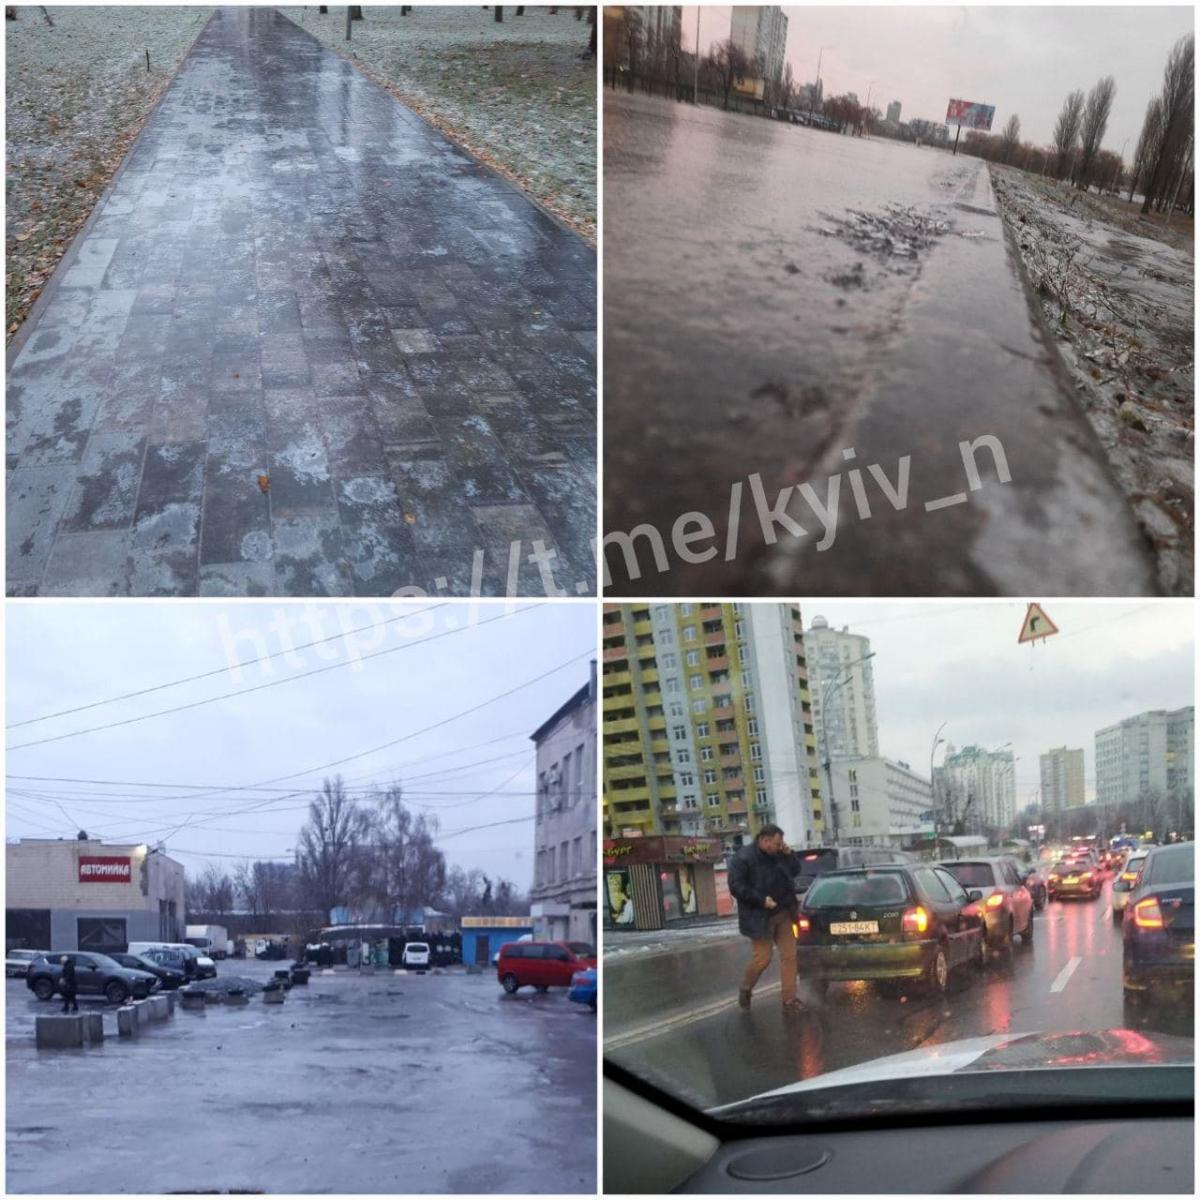 Kyiv Now